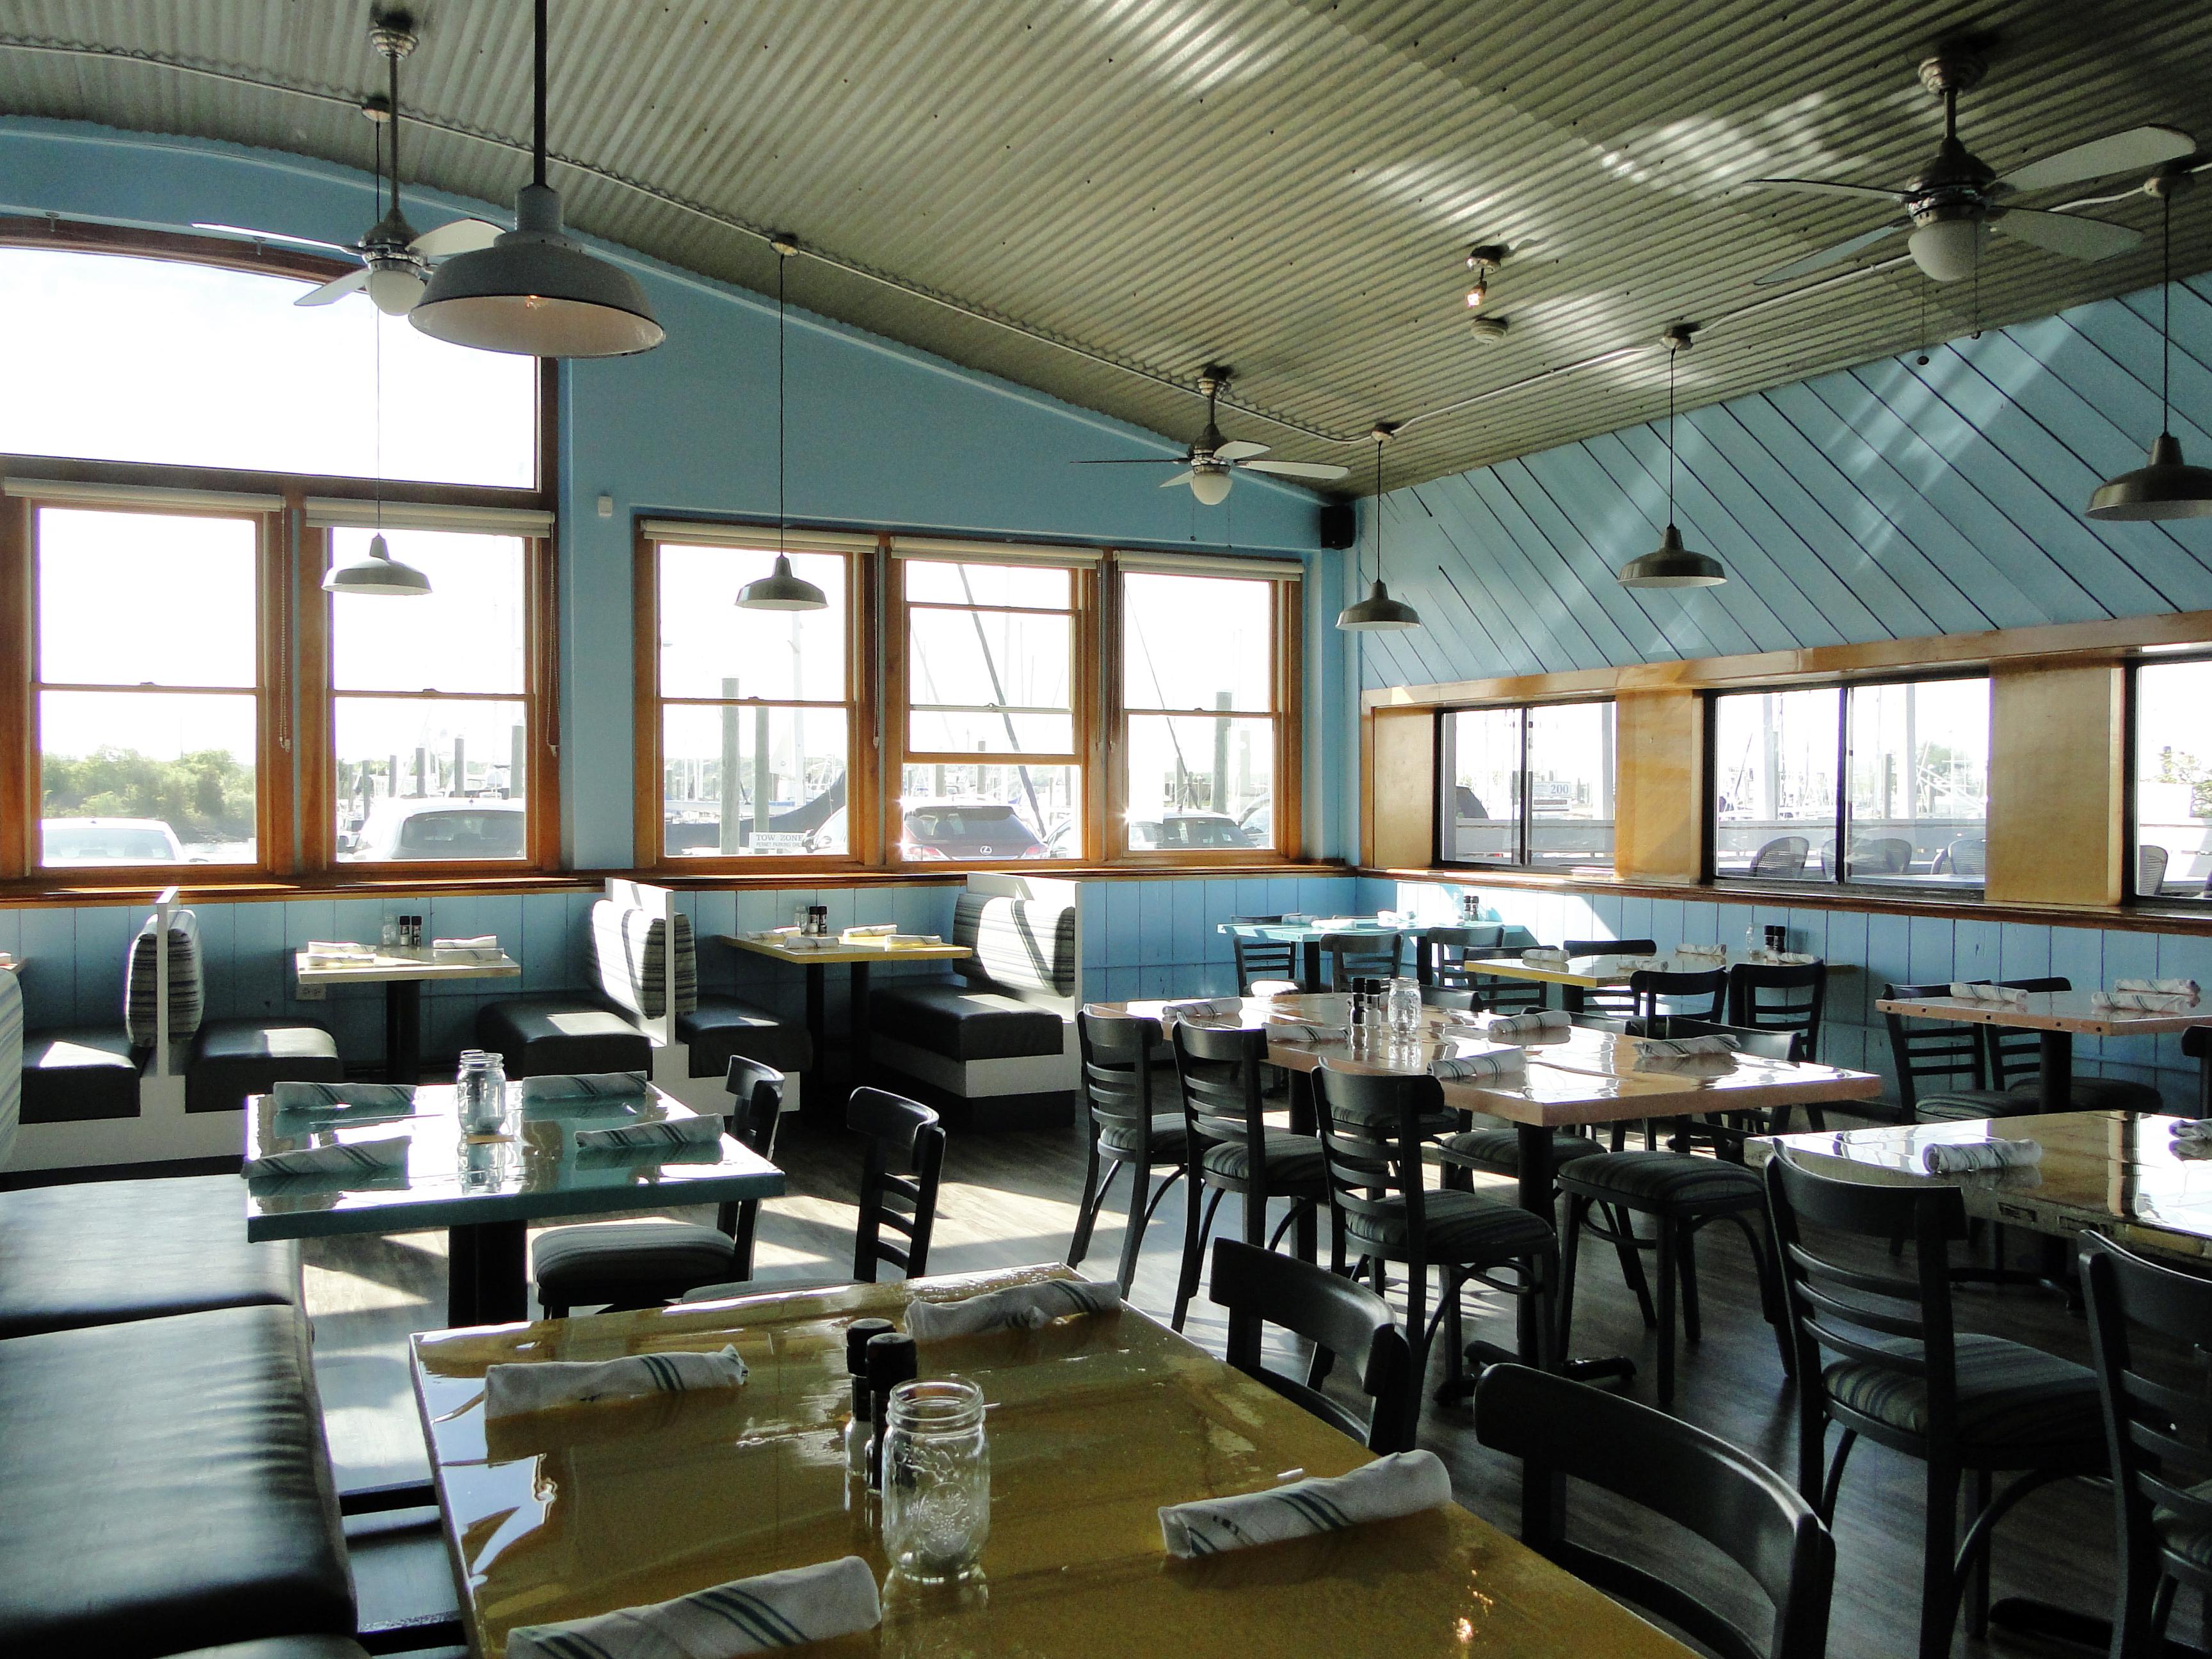 Gulf Stream Bar & Grille